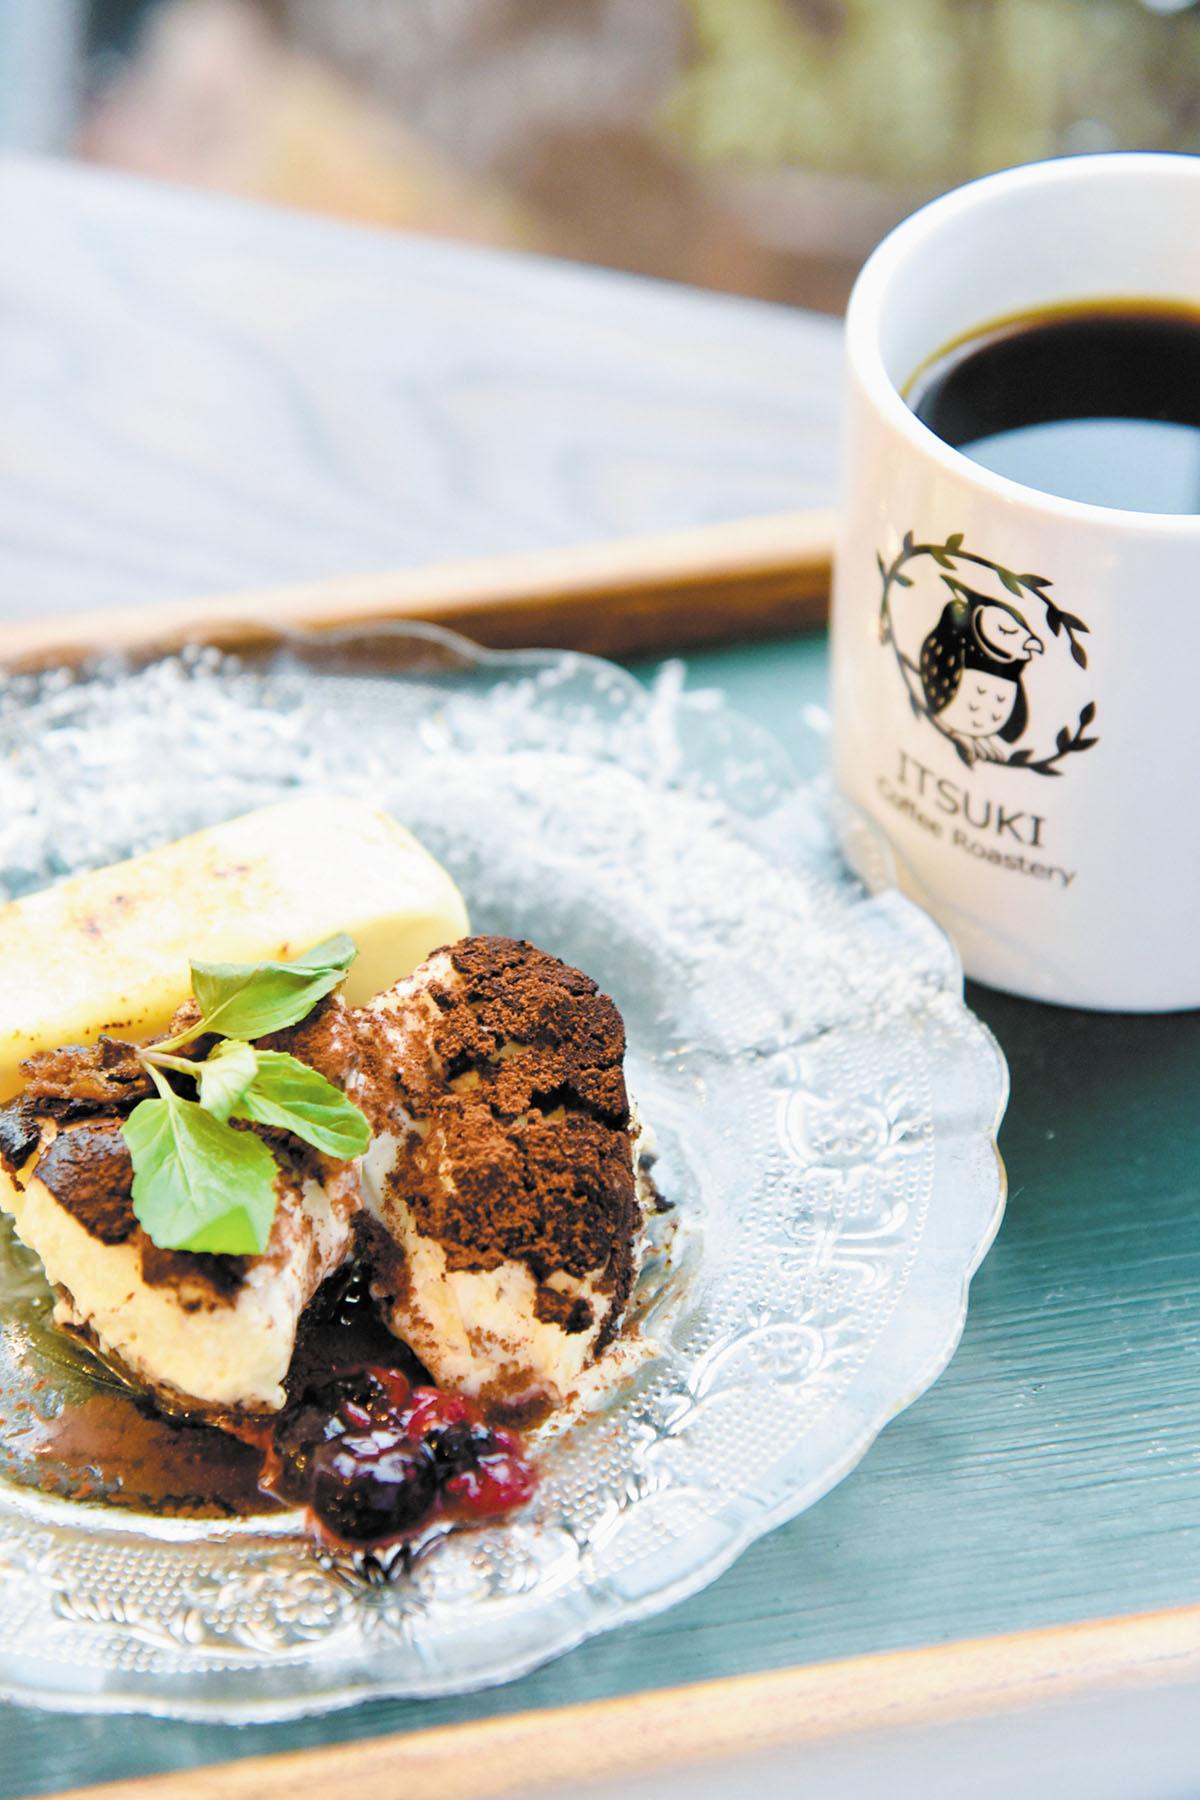 ITSUKI Coffee Roasteryメニュー写真